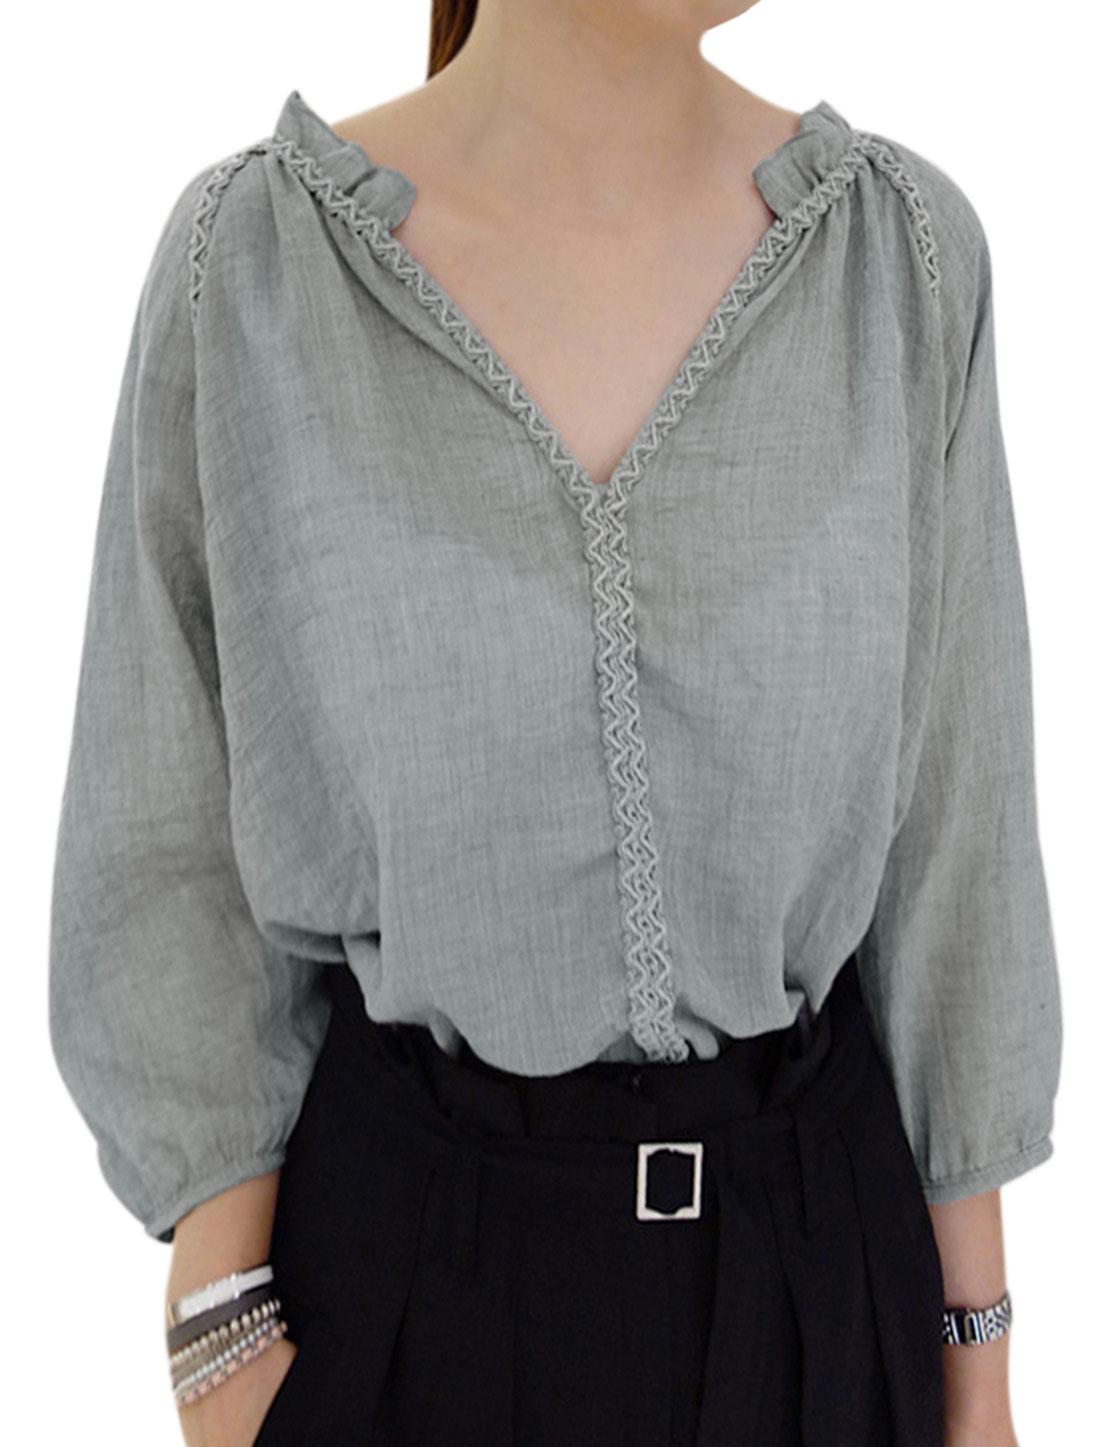 Woman Stitching Detail 3/4 Raglan Sleeves High Low Hem Top Gray S